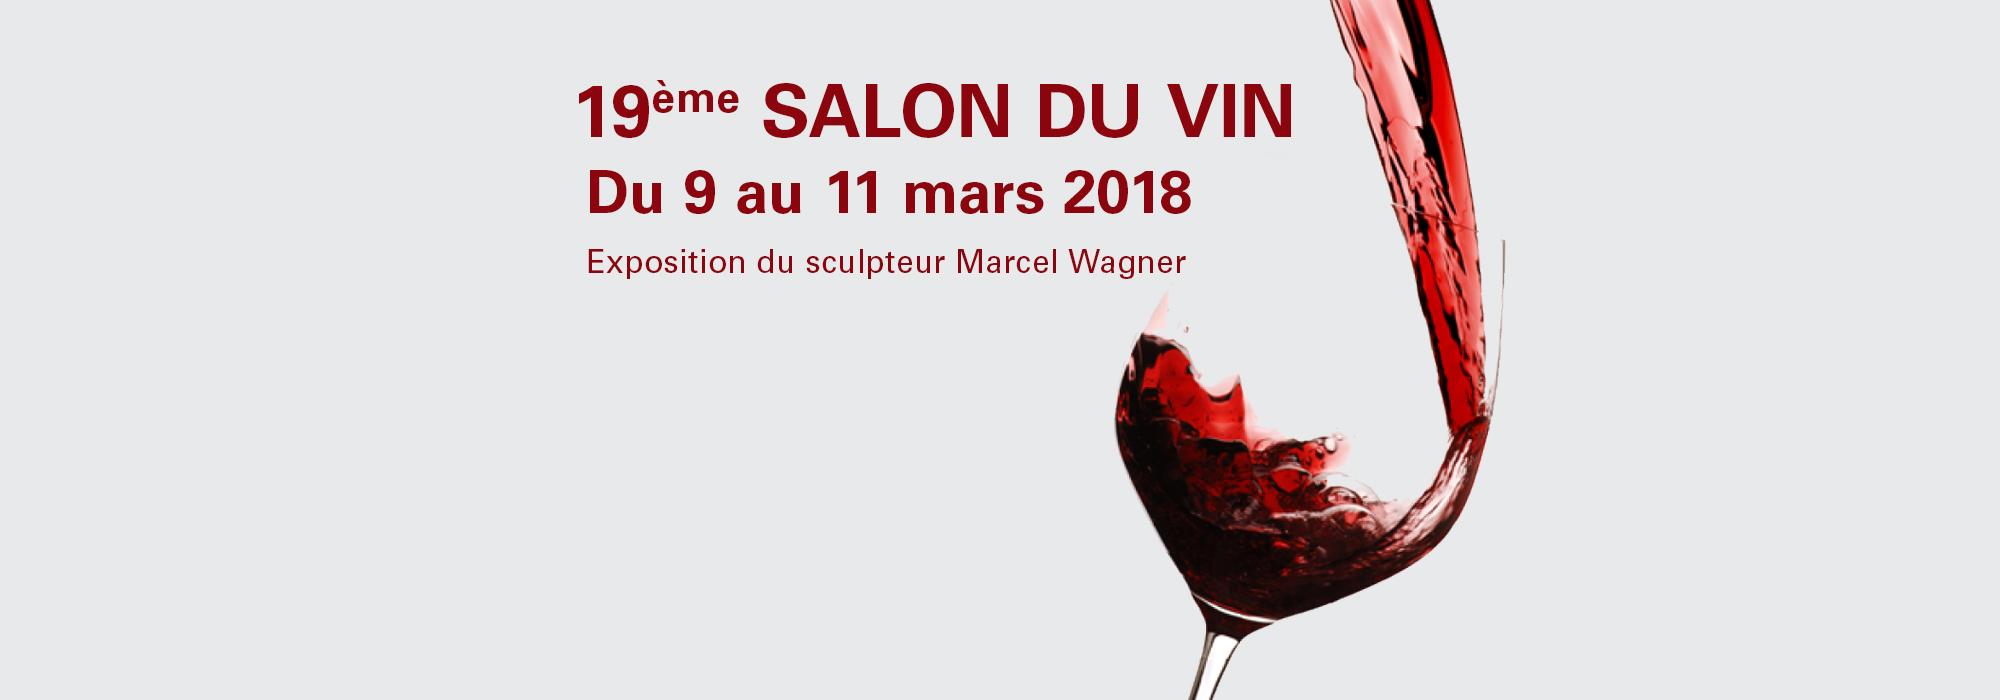 Salon du Vin 2018